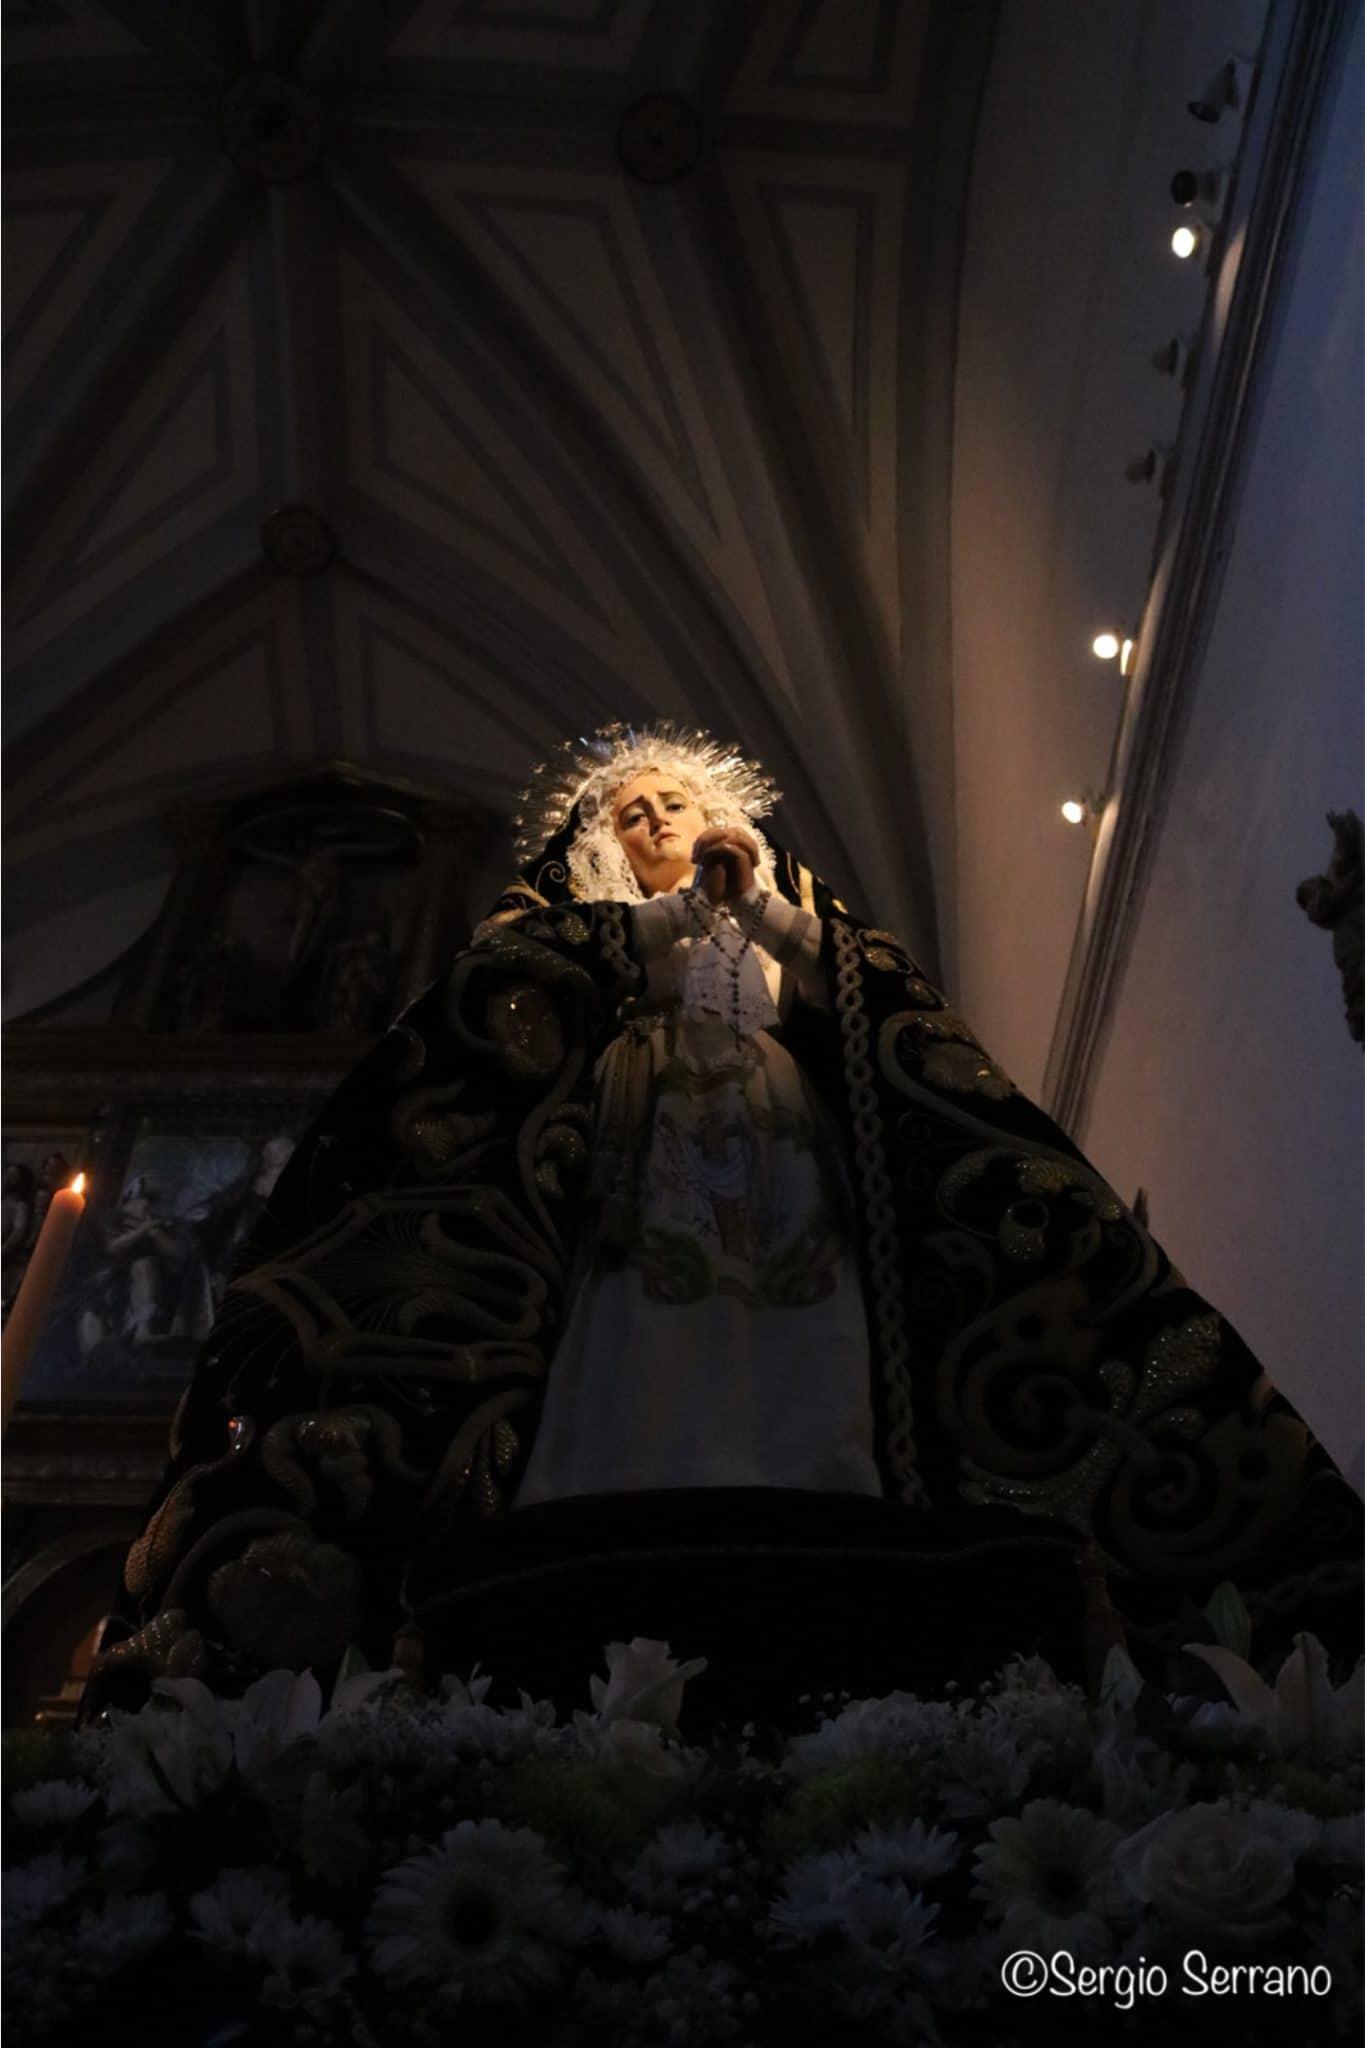 Semana Santa en Valladolid - Franciscana Seglar